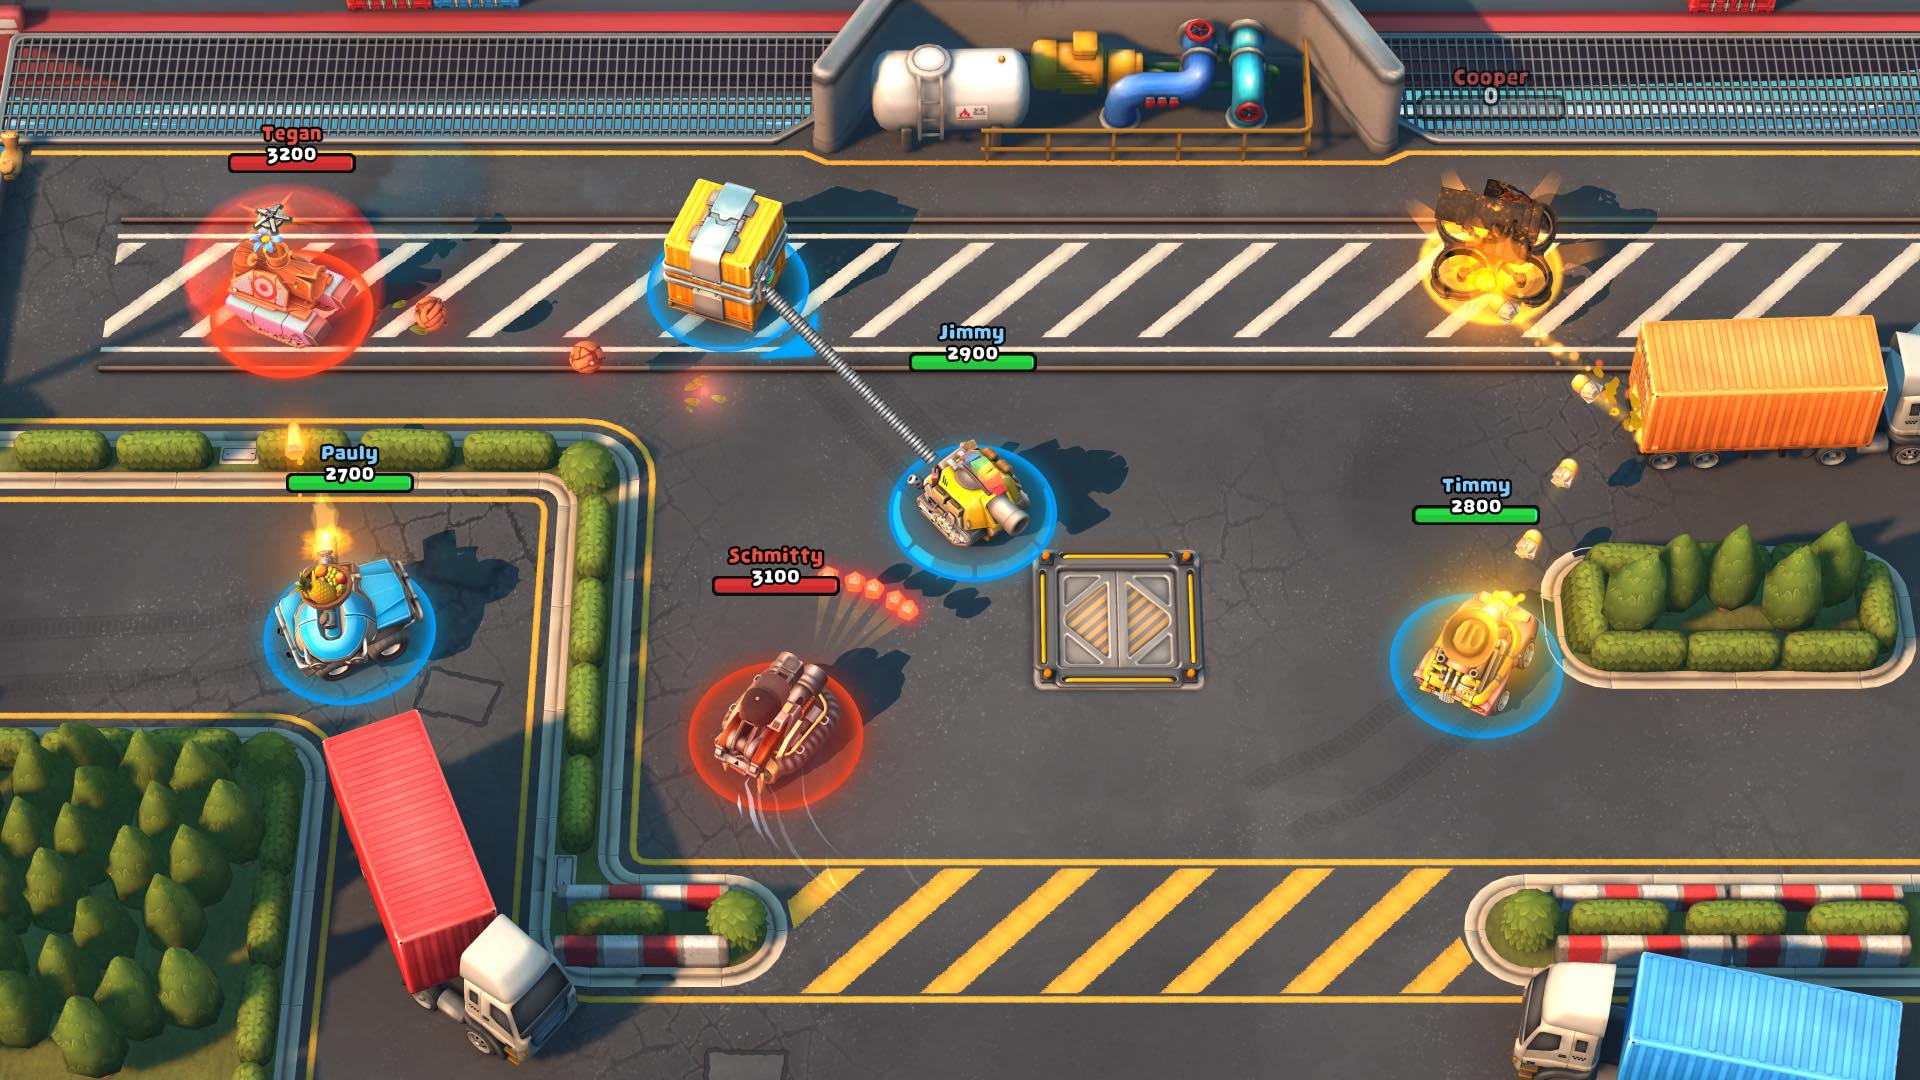 Pico Tanks by Panda Arcade